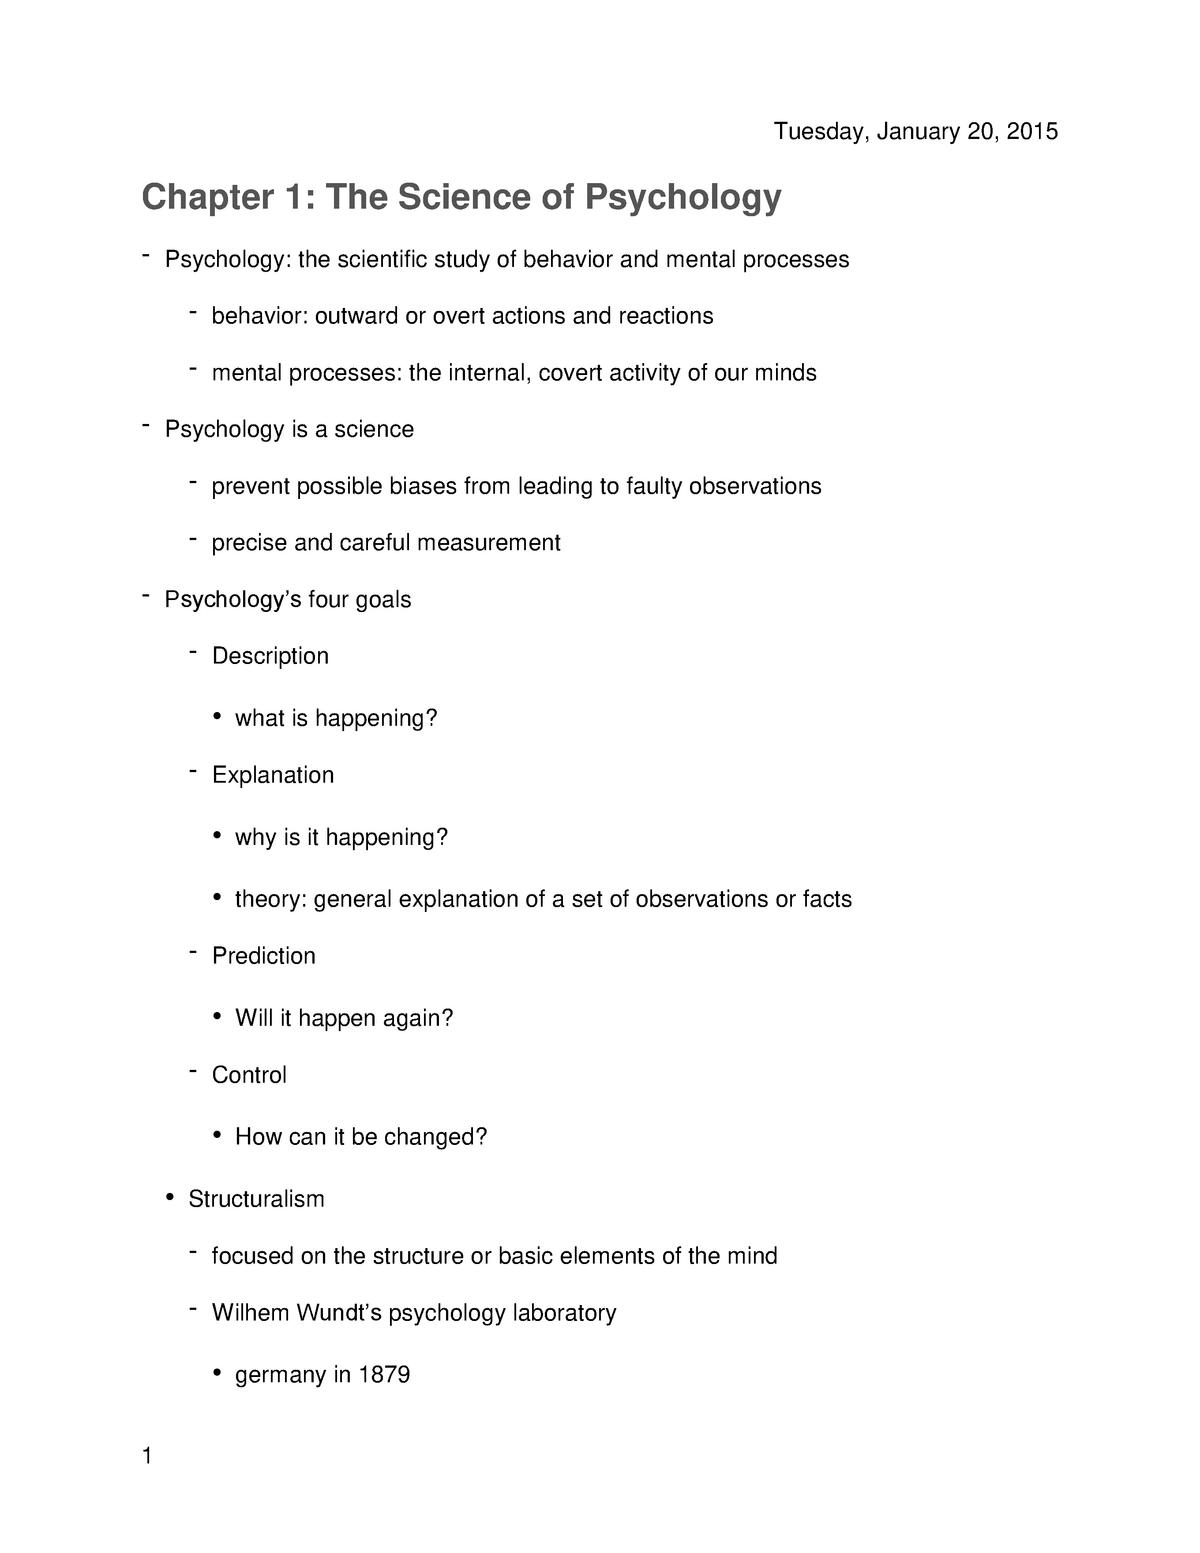 Summary - chapters 1-3, 5, 8, 9, 11, 12 - PSY 1300 - TTU